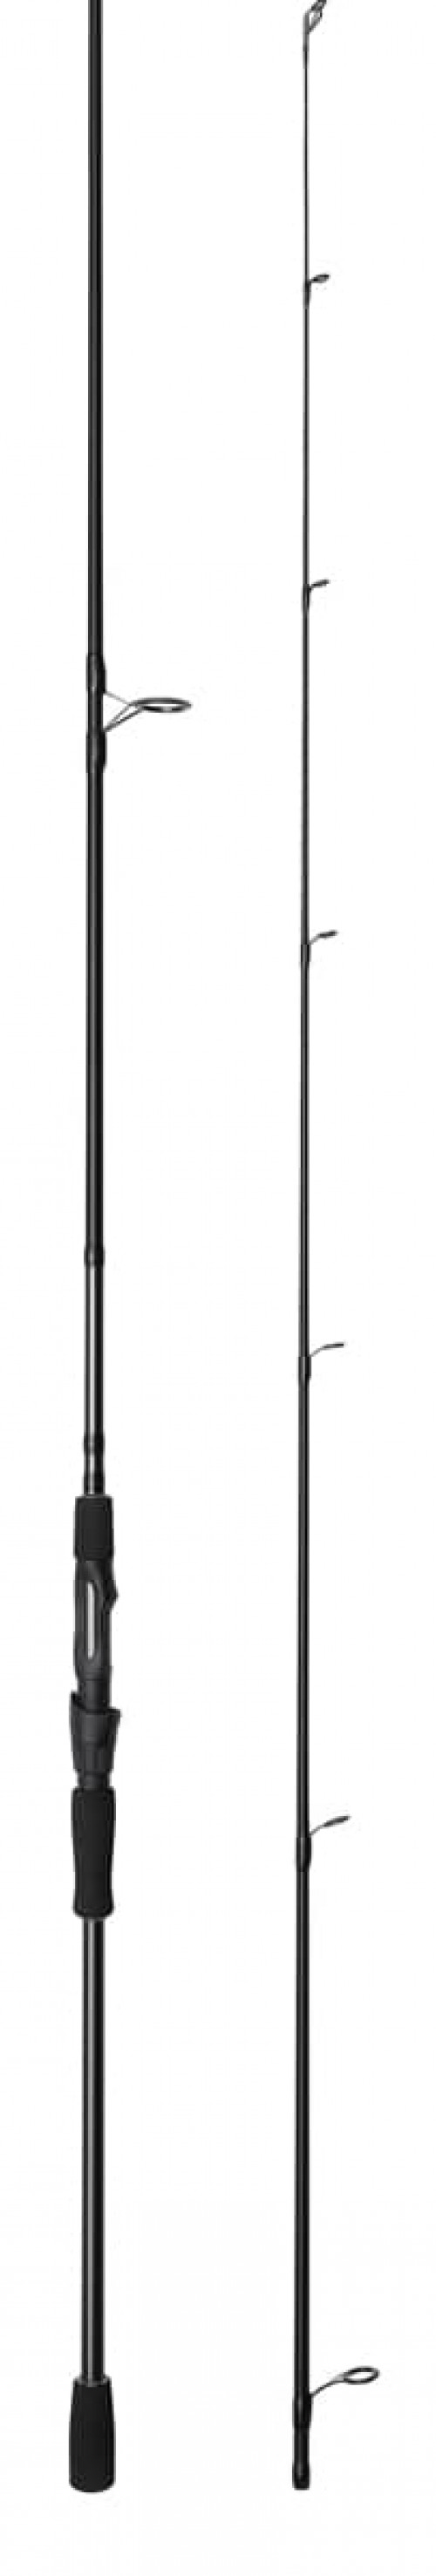 Okuma Altera Spin  6'0'' 180cm 4-12g - 2sec